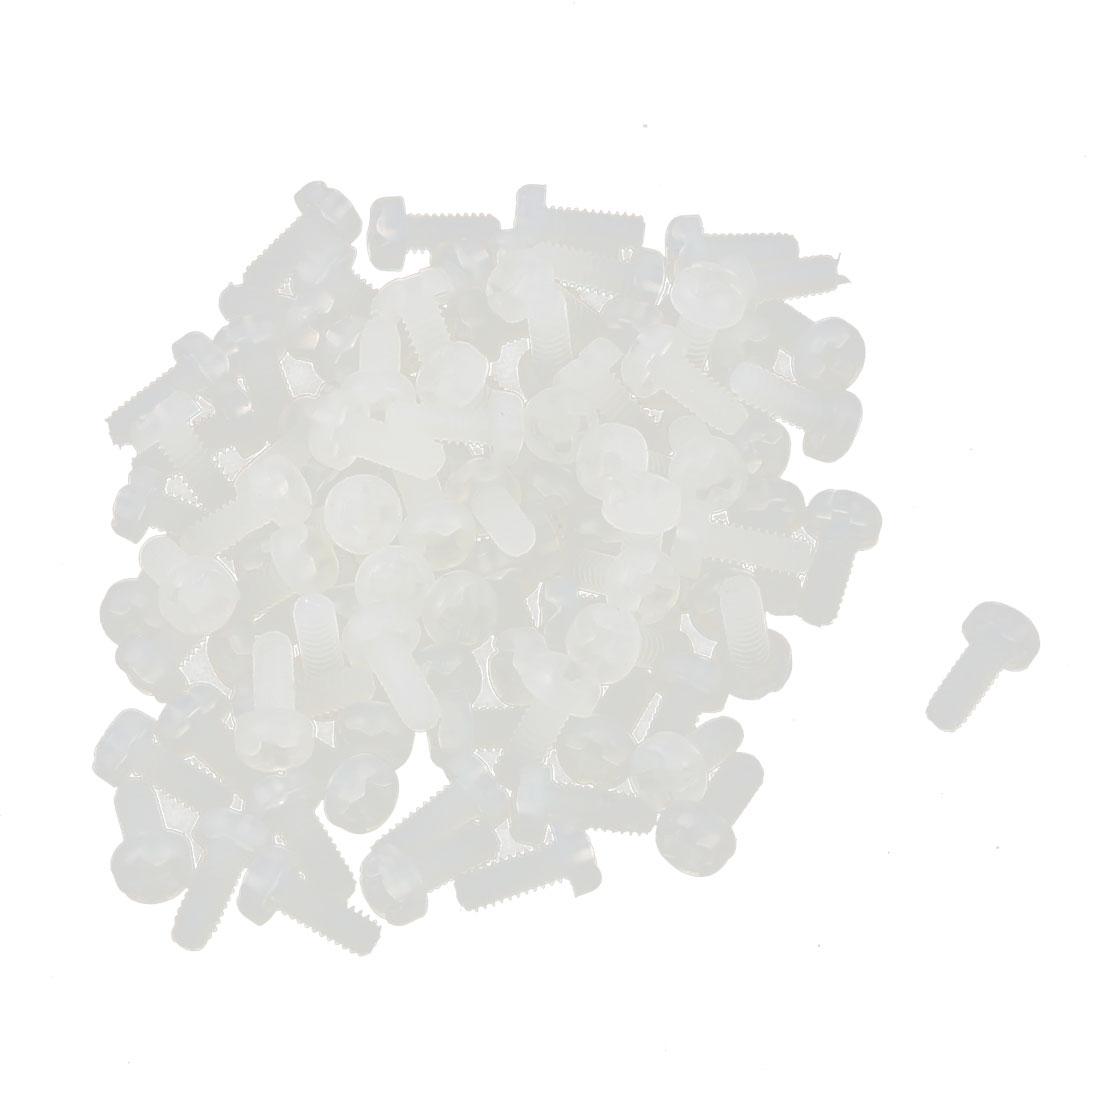 M2 x 5mm Nylon Phillips Cross Pan Head Machine Screws White 50 PCS